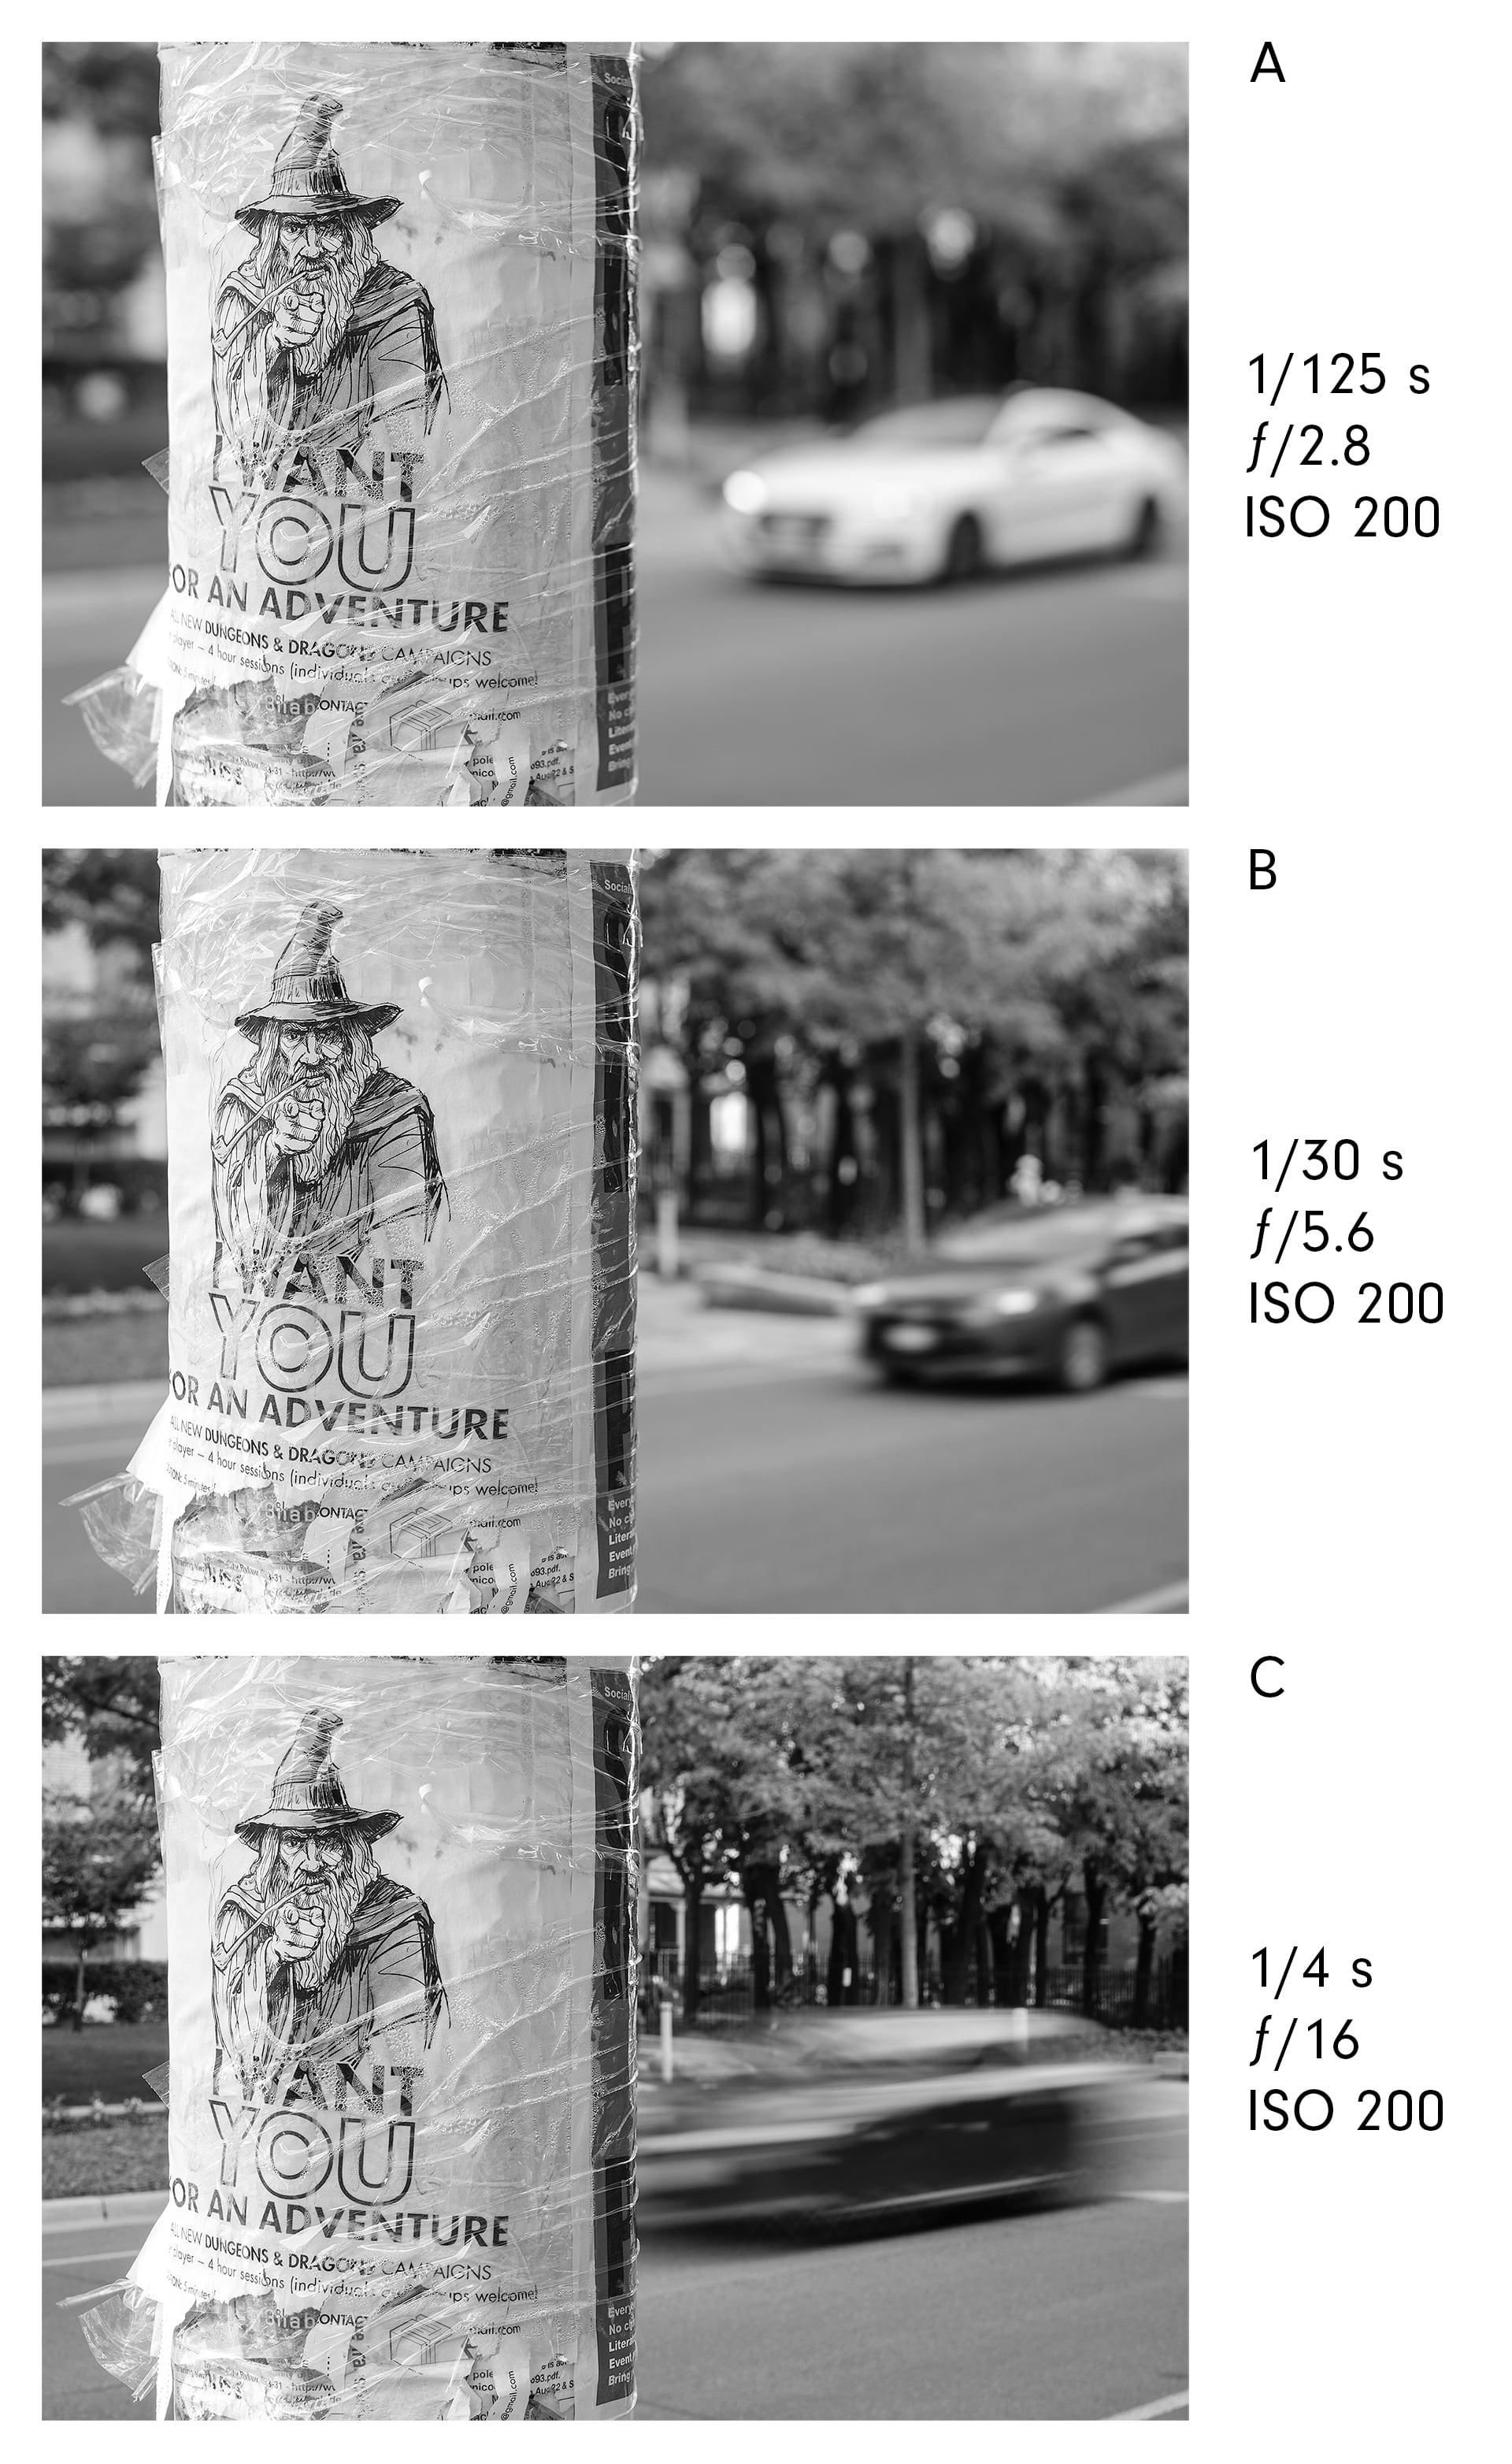 Reciprocity law, aperture and shutter speed trade-offs